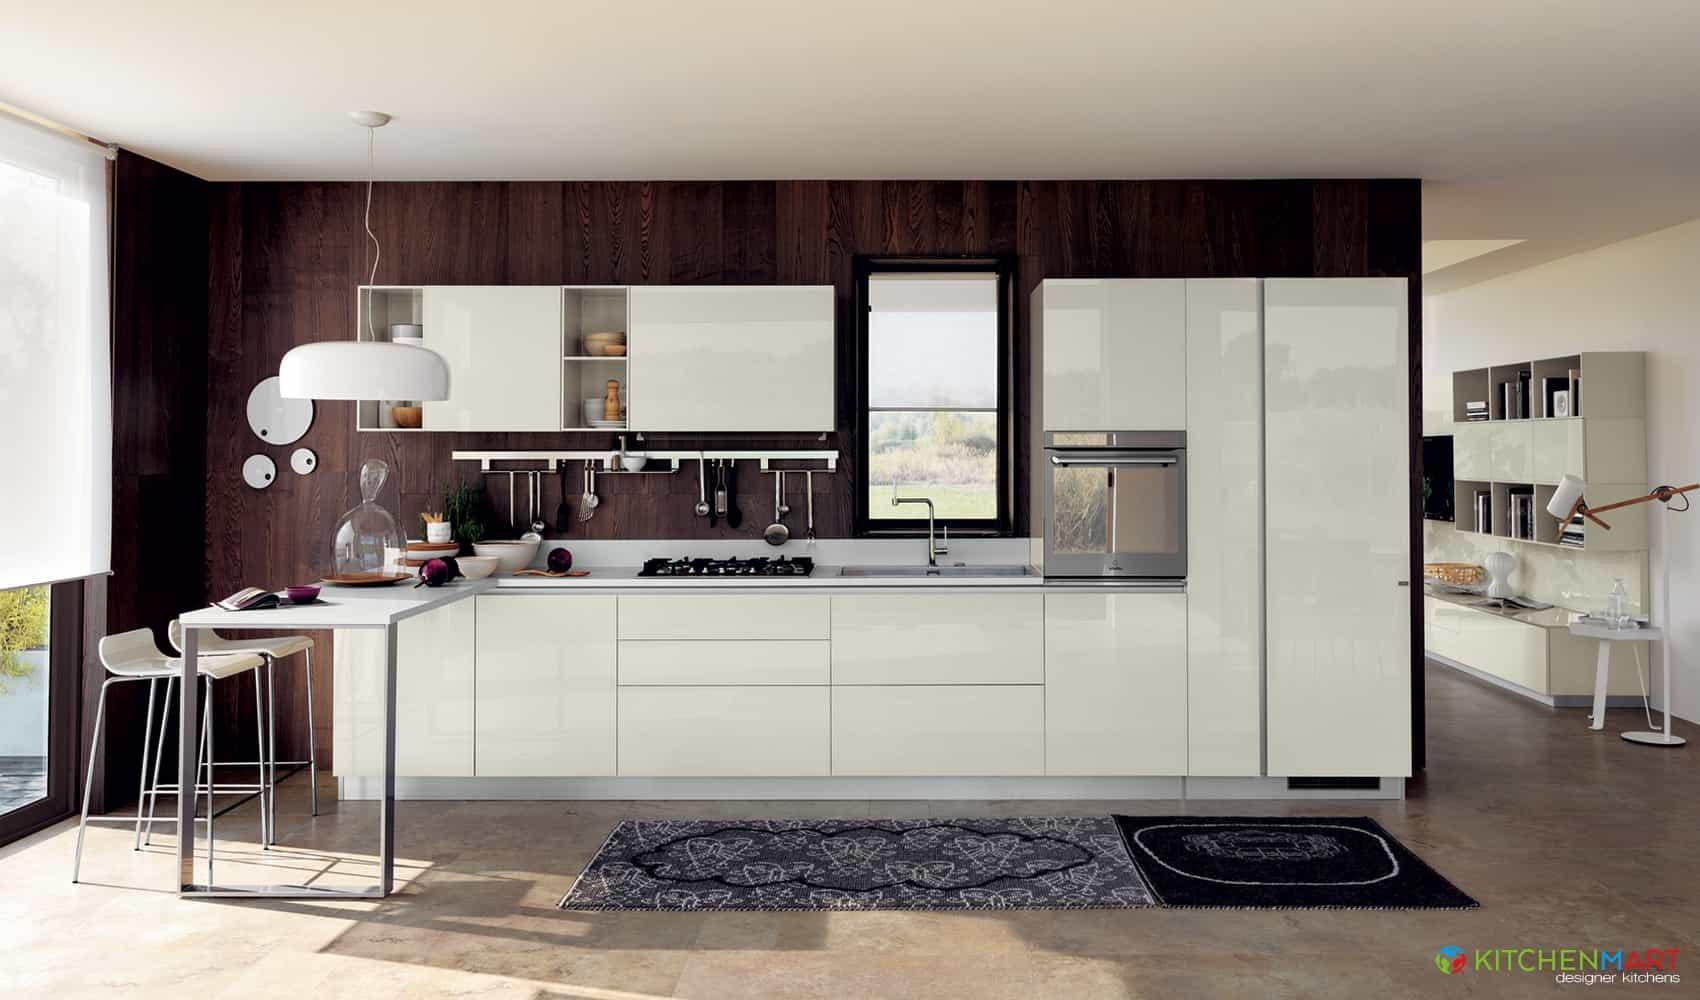 Designer KitchensDesigner Kitchens